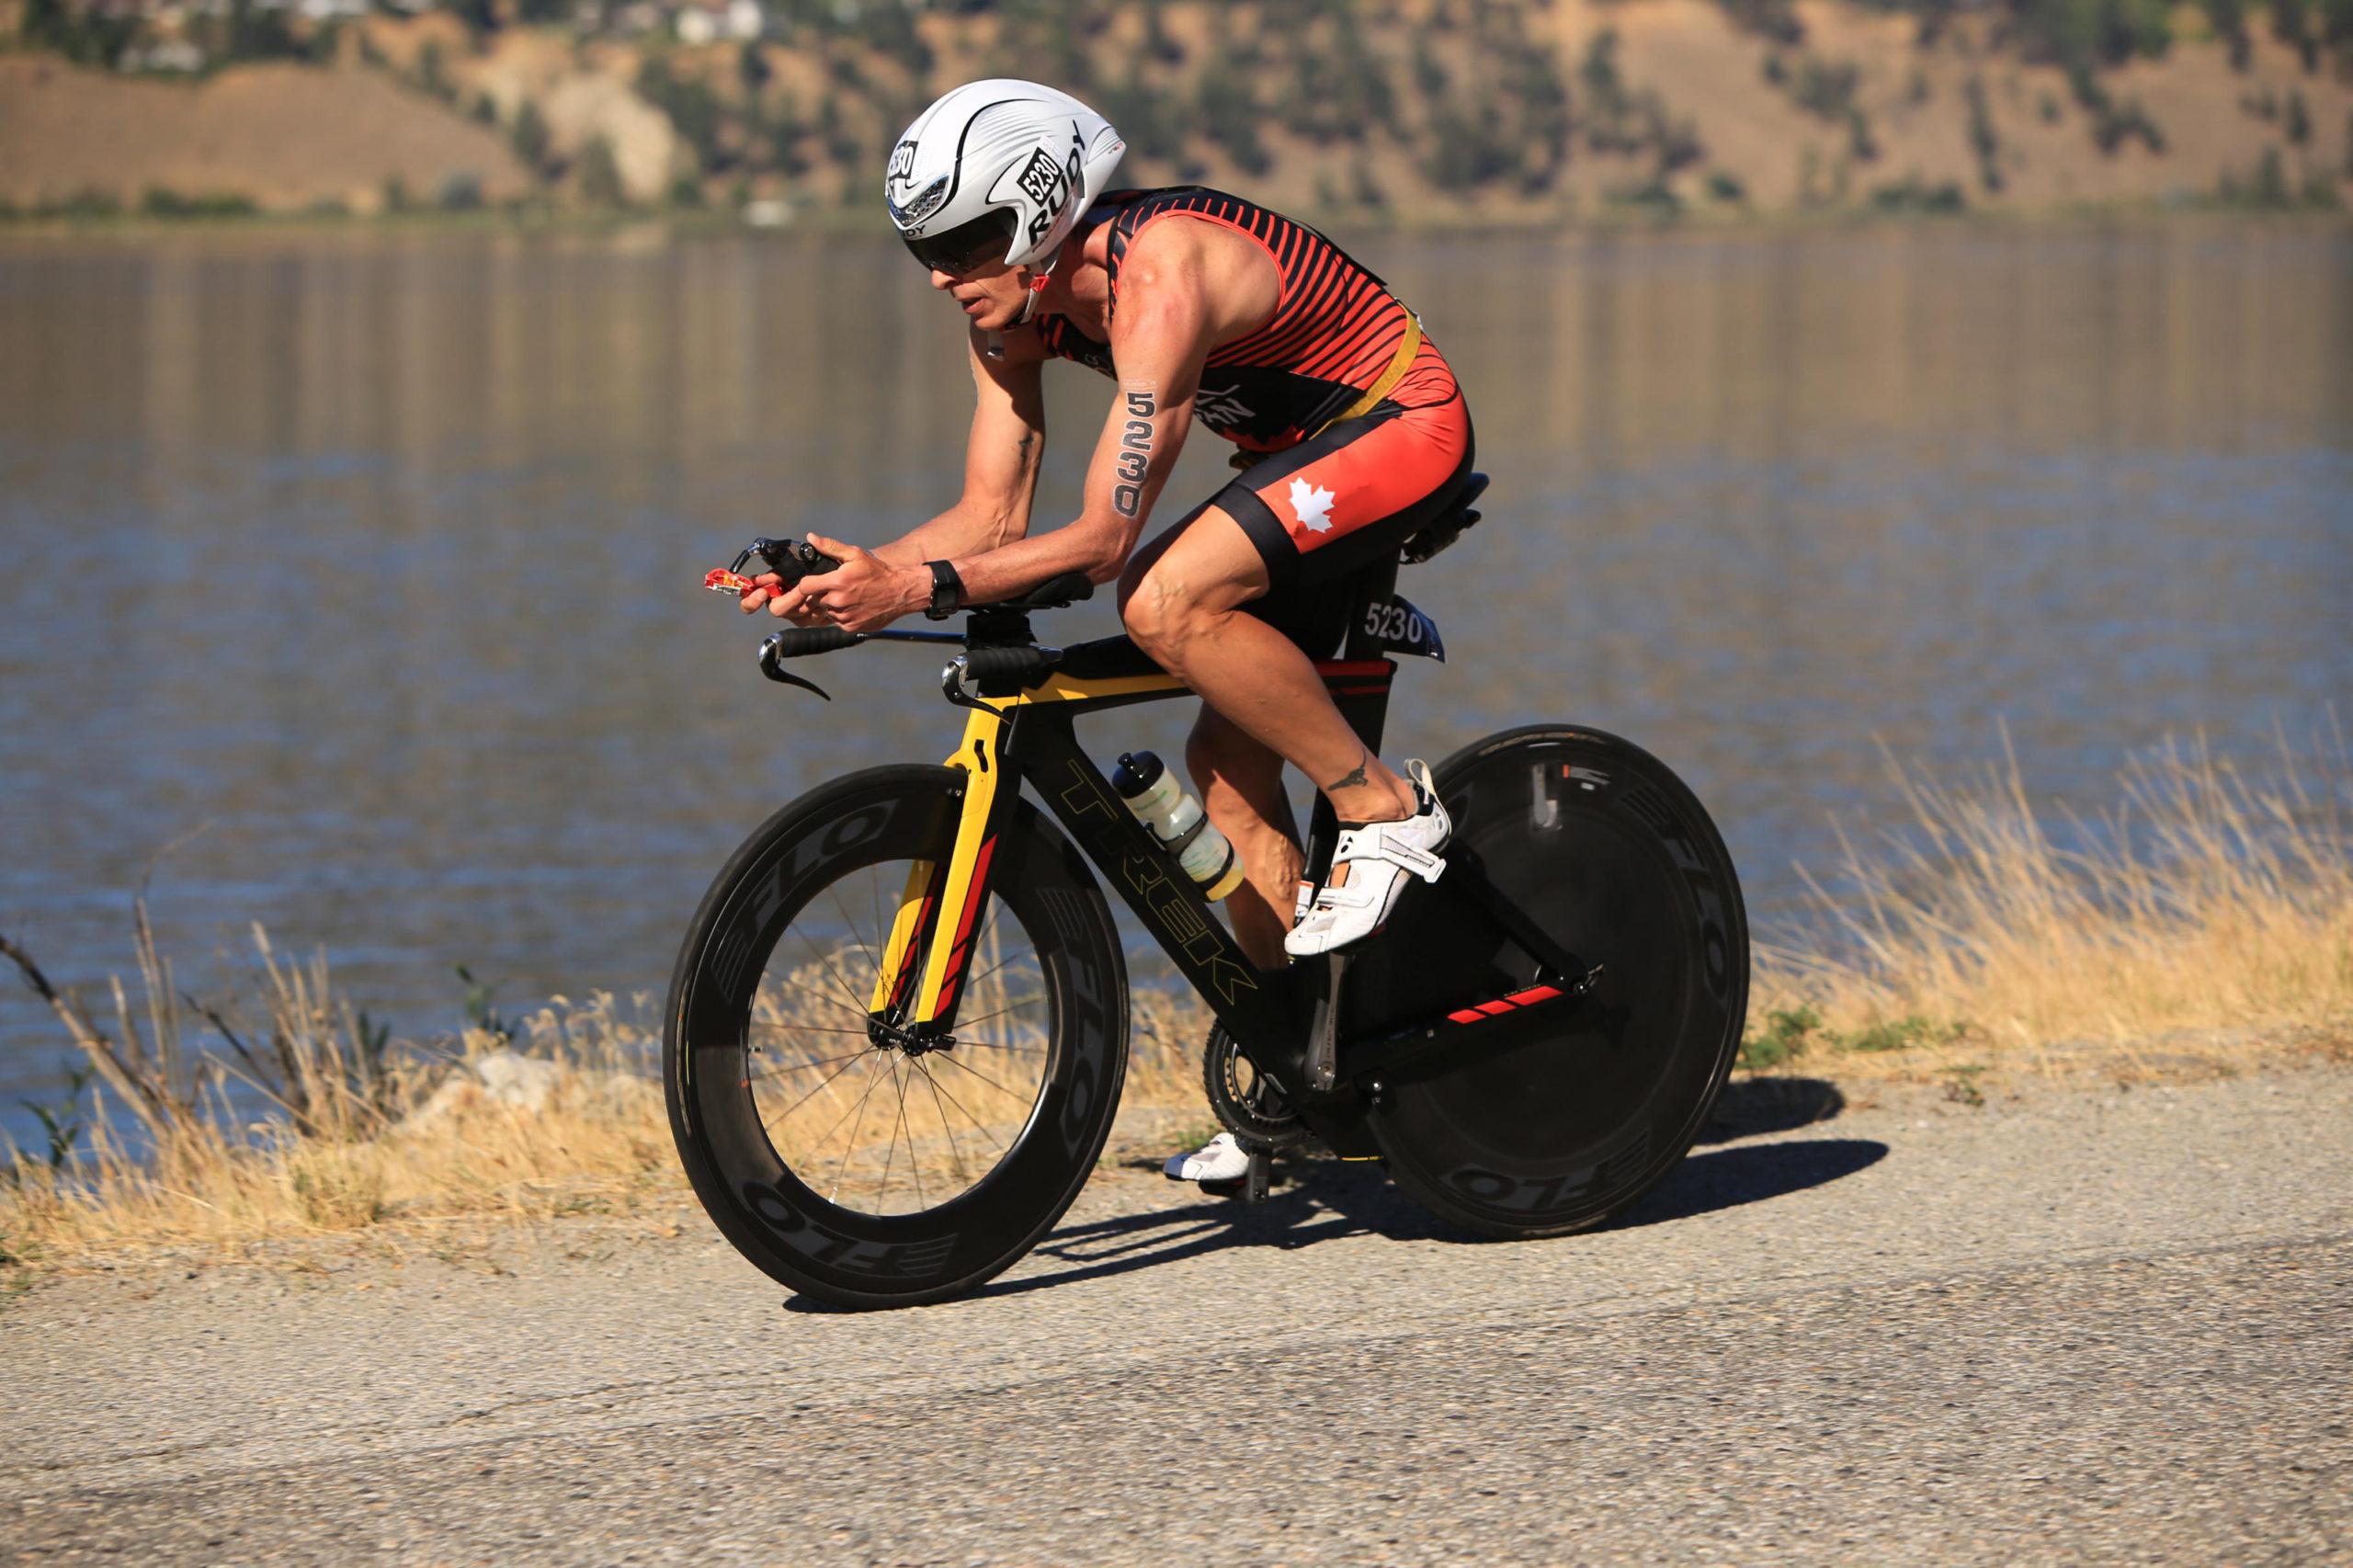 Mike Neill Riding Bike at 2017 ITU World Long Distance Triathlon Championship in Victoria